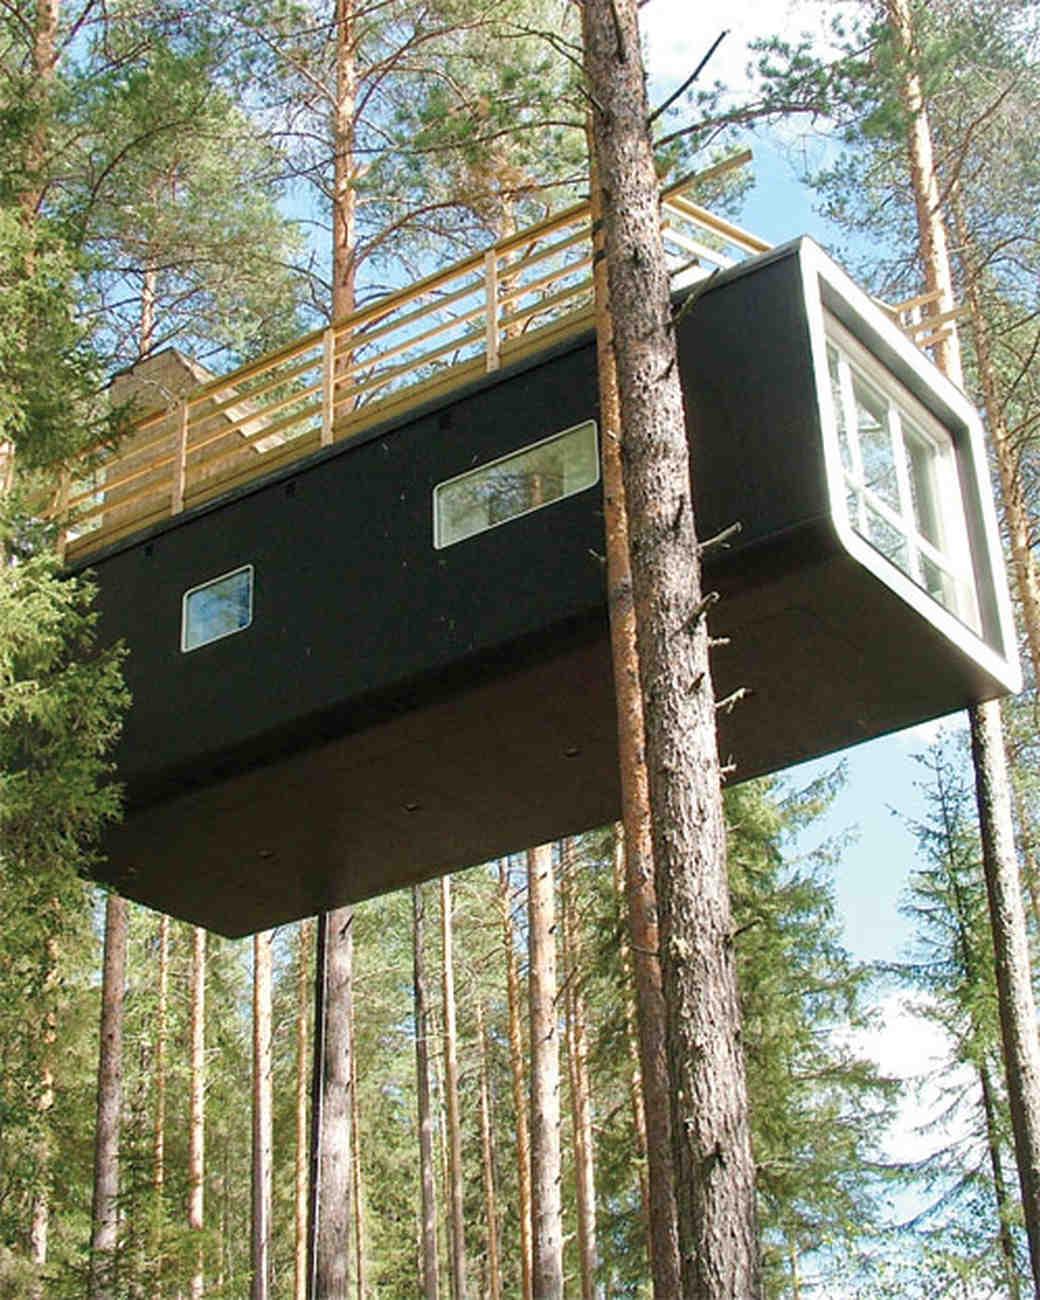 ms106931_spr11_treehotel_cabin_ext_02.jpg